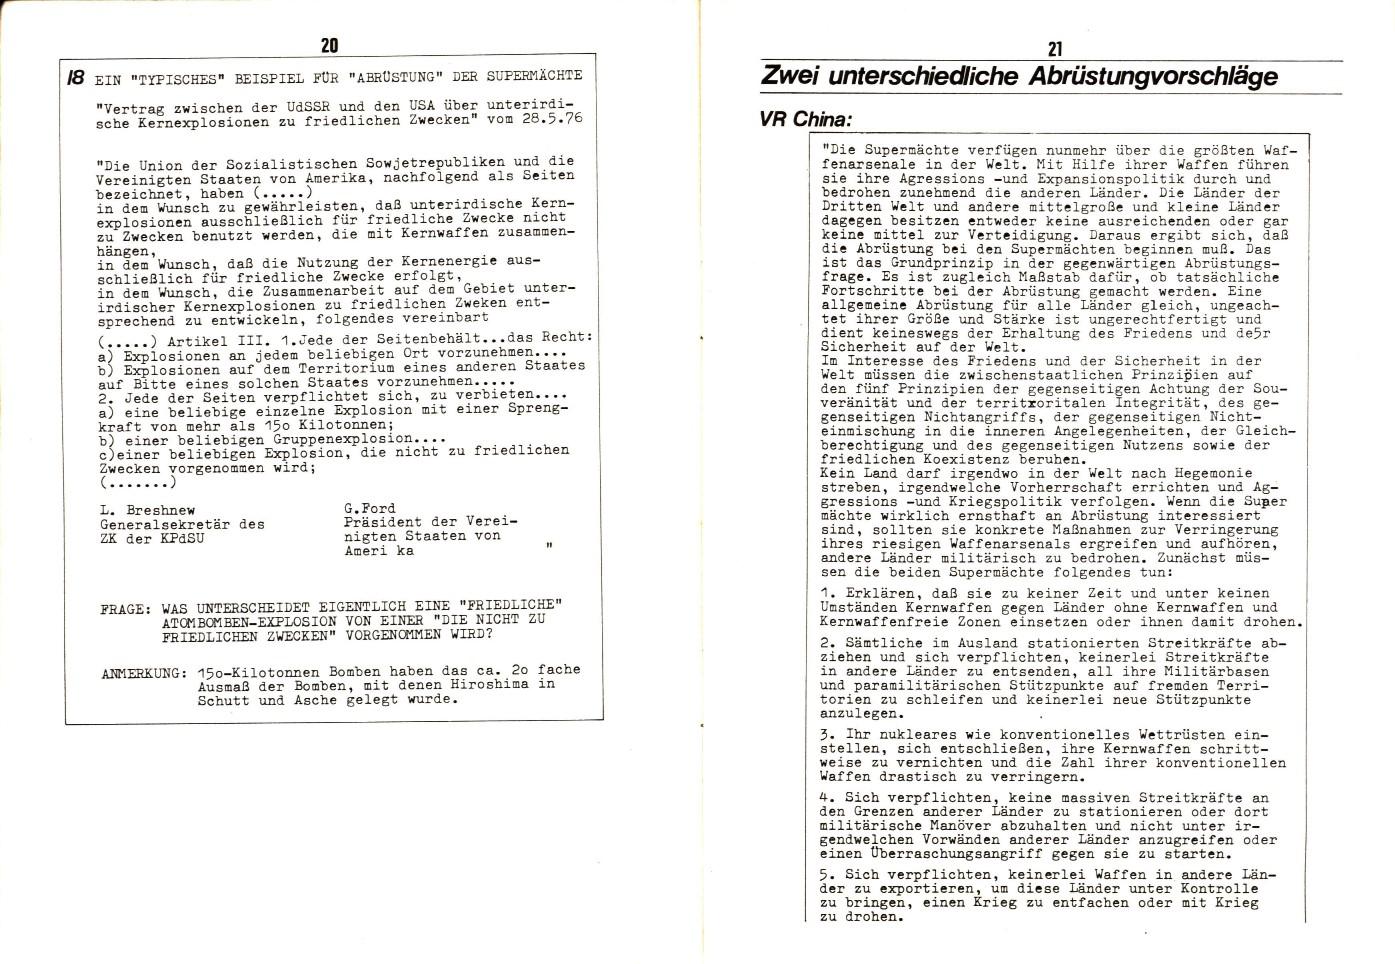 KJVD_1979_Dokumente_zum_Antikriegstag_14